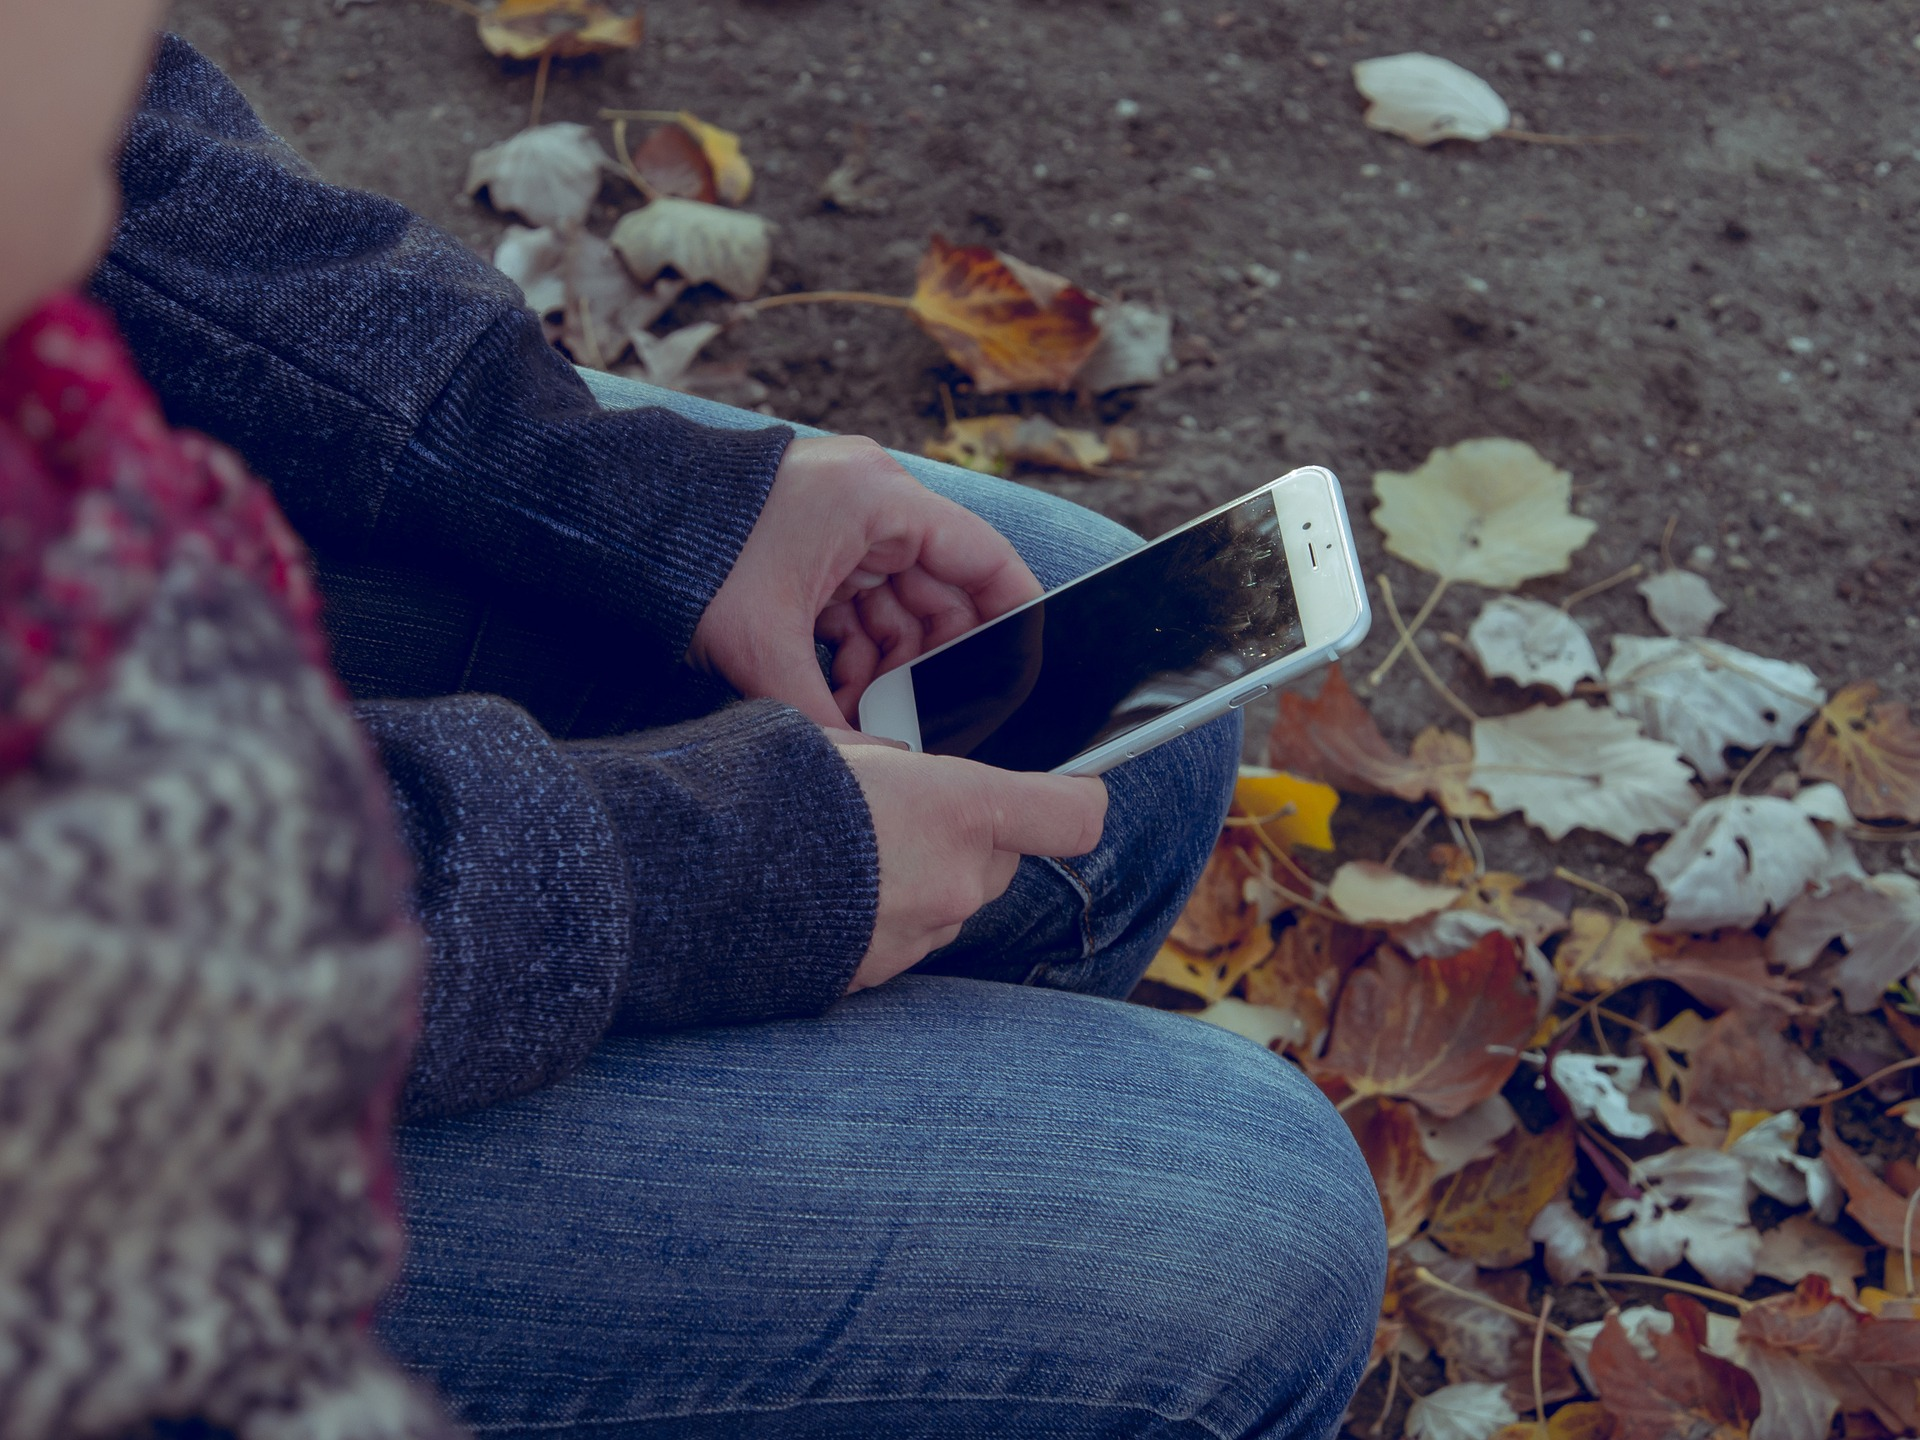 Using apple iphone photo